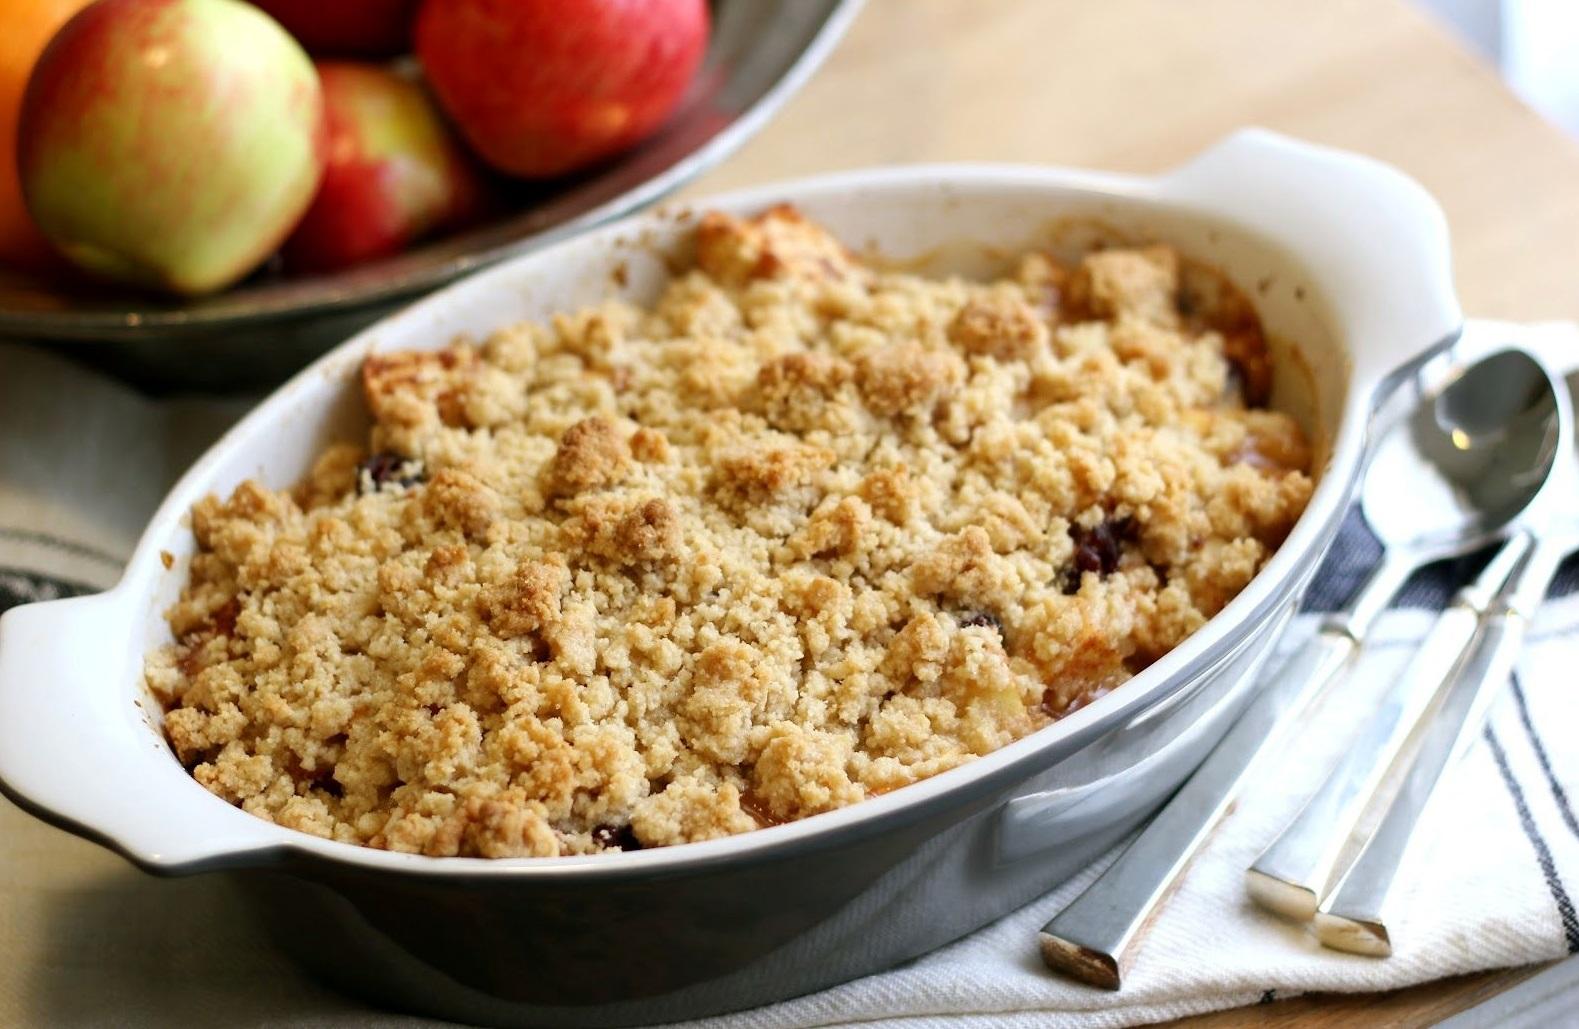 Яблочный крамбл рецепт с фото